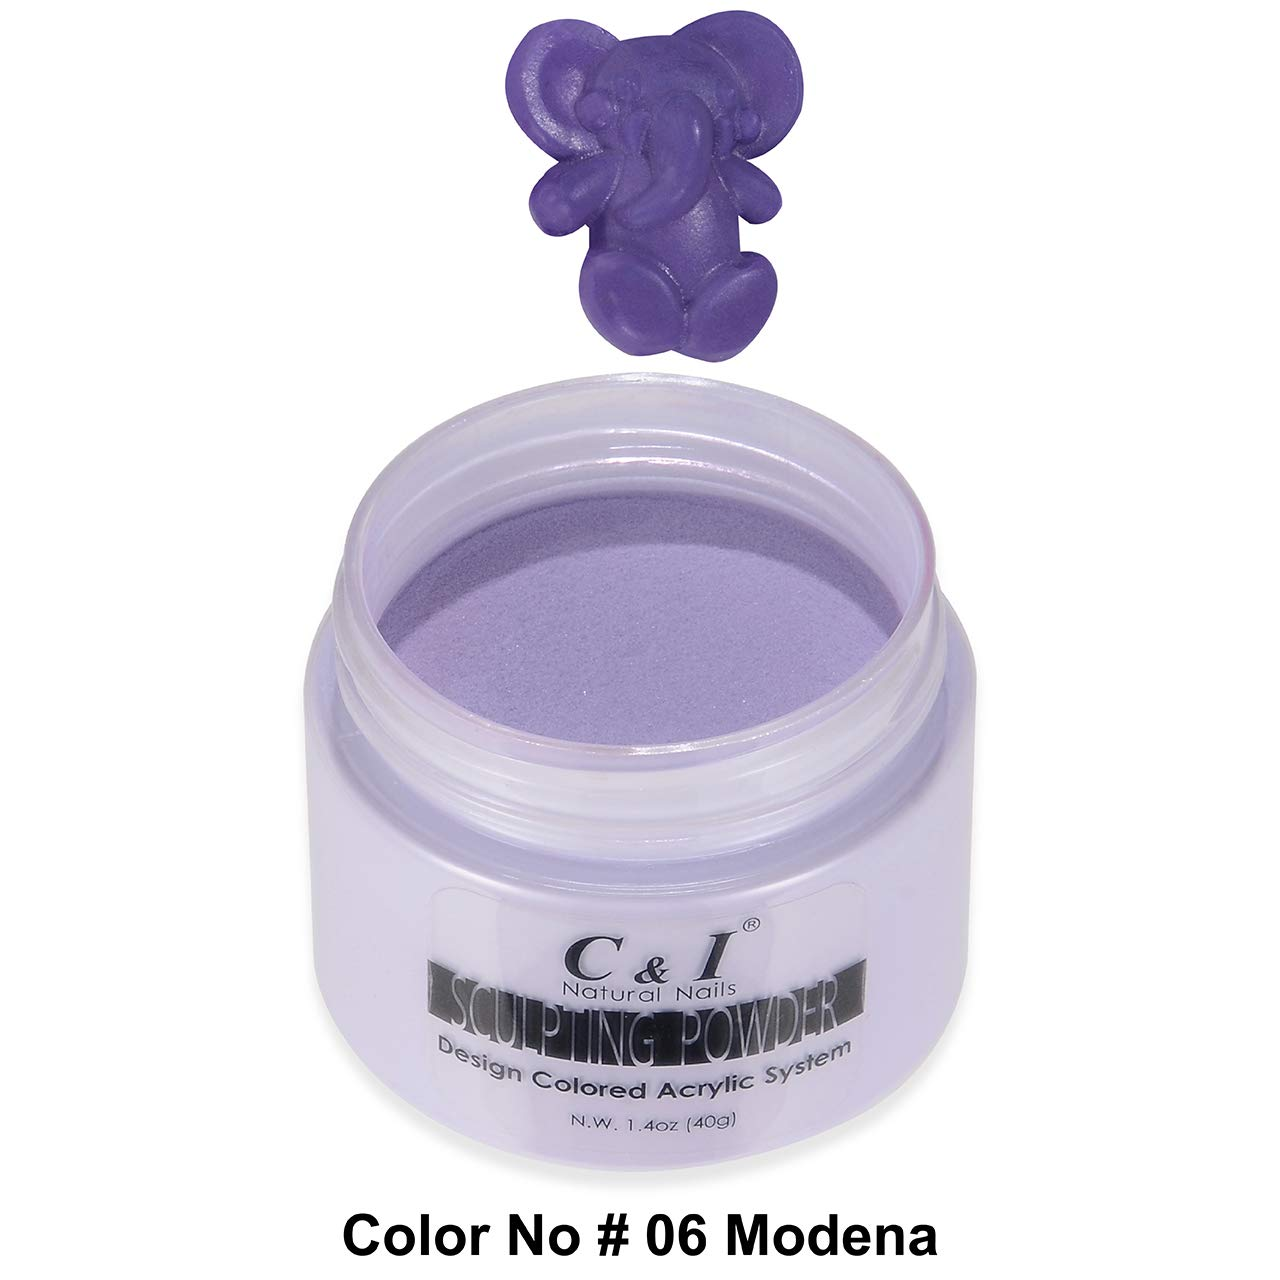 C&I Acrylic Powder, 6 Modena, 3 D Nail Flower, Sculpting Nail Powder, 1.4 oz, 40 g